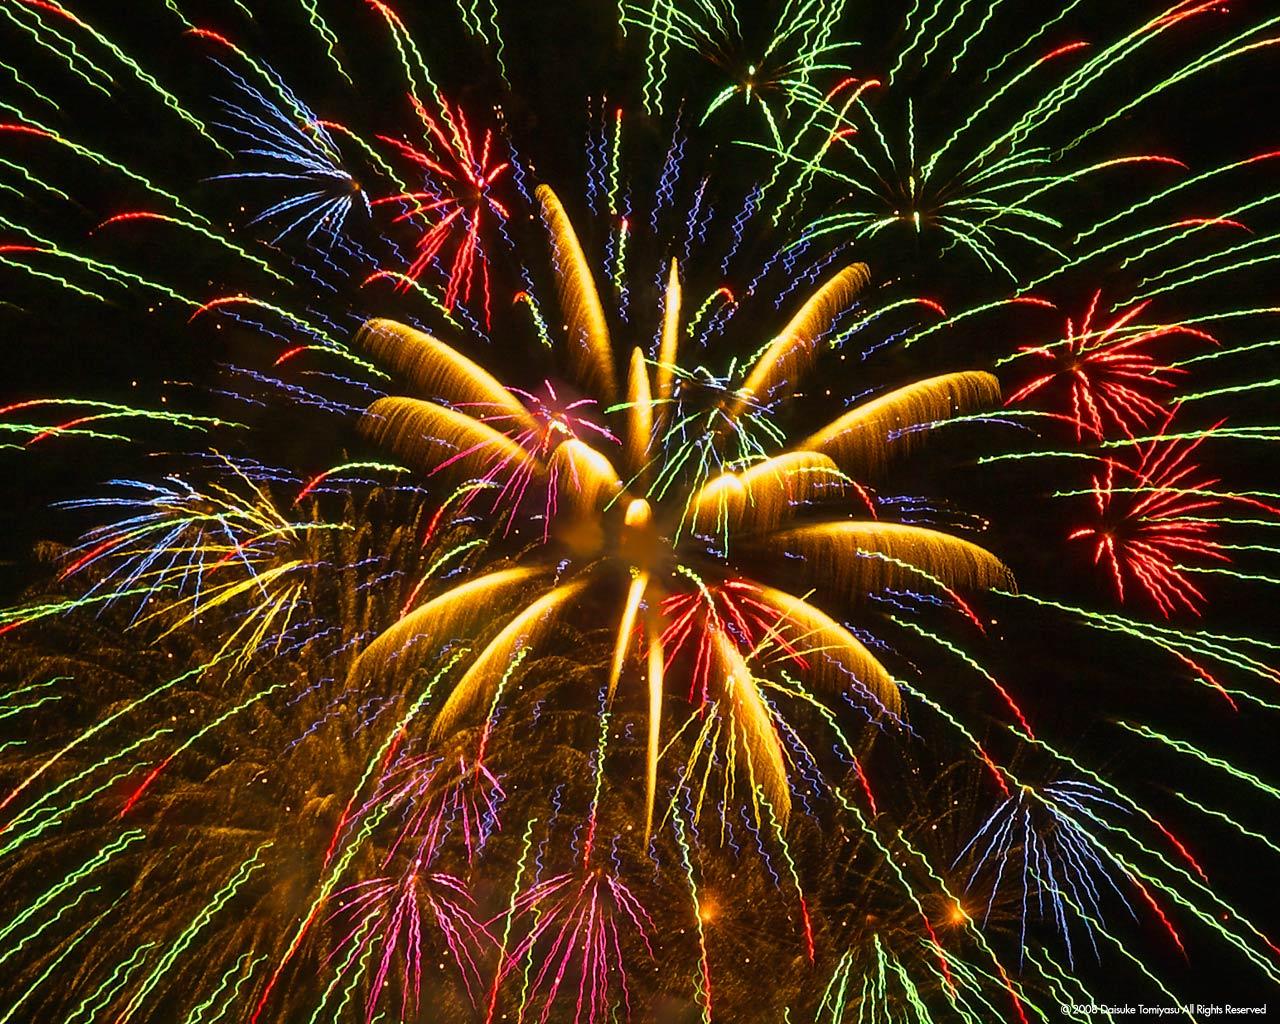 http://3.bp.blogspot.com/-u6n940HMxXs/ToHFKUqusTI/AAAAAAAABP8/Q33WWvpu2SY/s1600/Fireworks_High-Quality-Mobile-Desktop-wallpapers.stillmaza.com-2.jpg